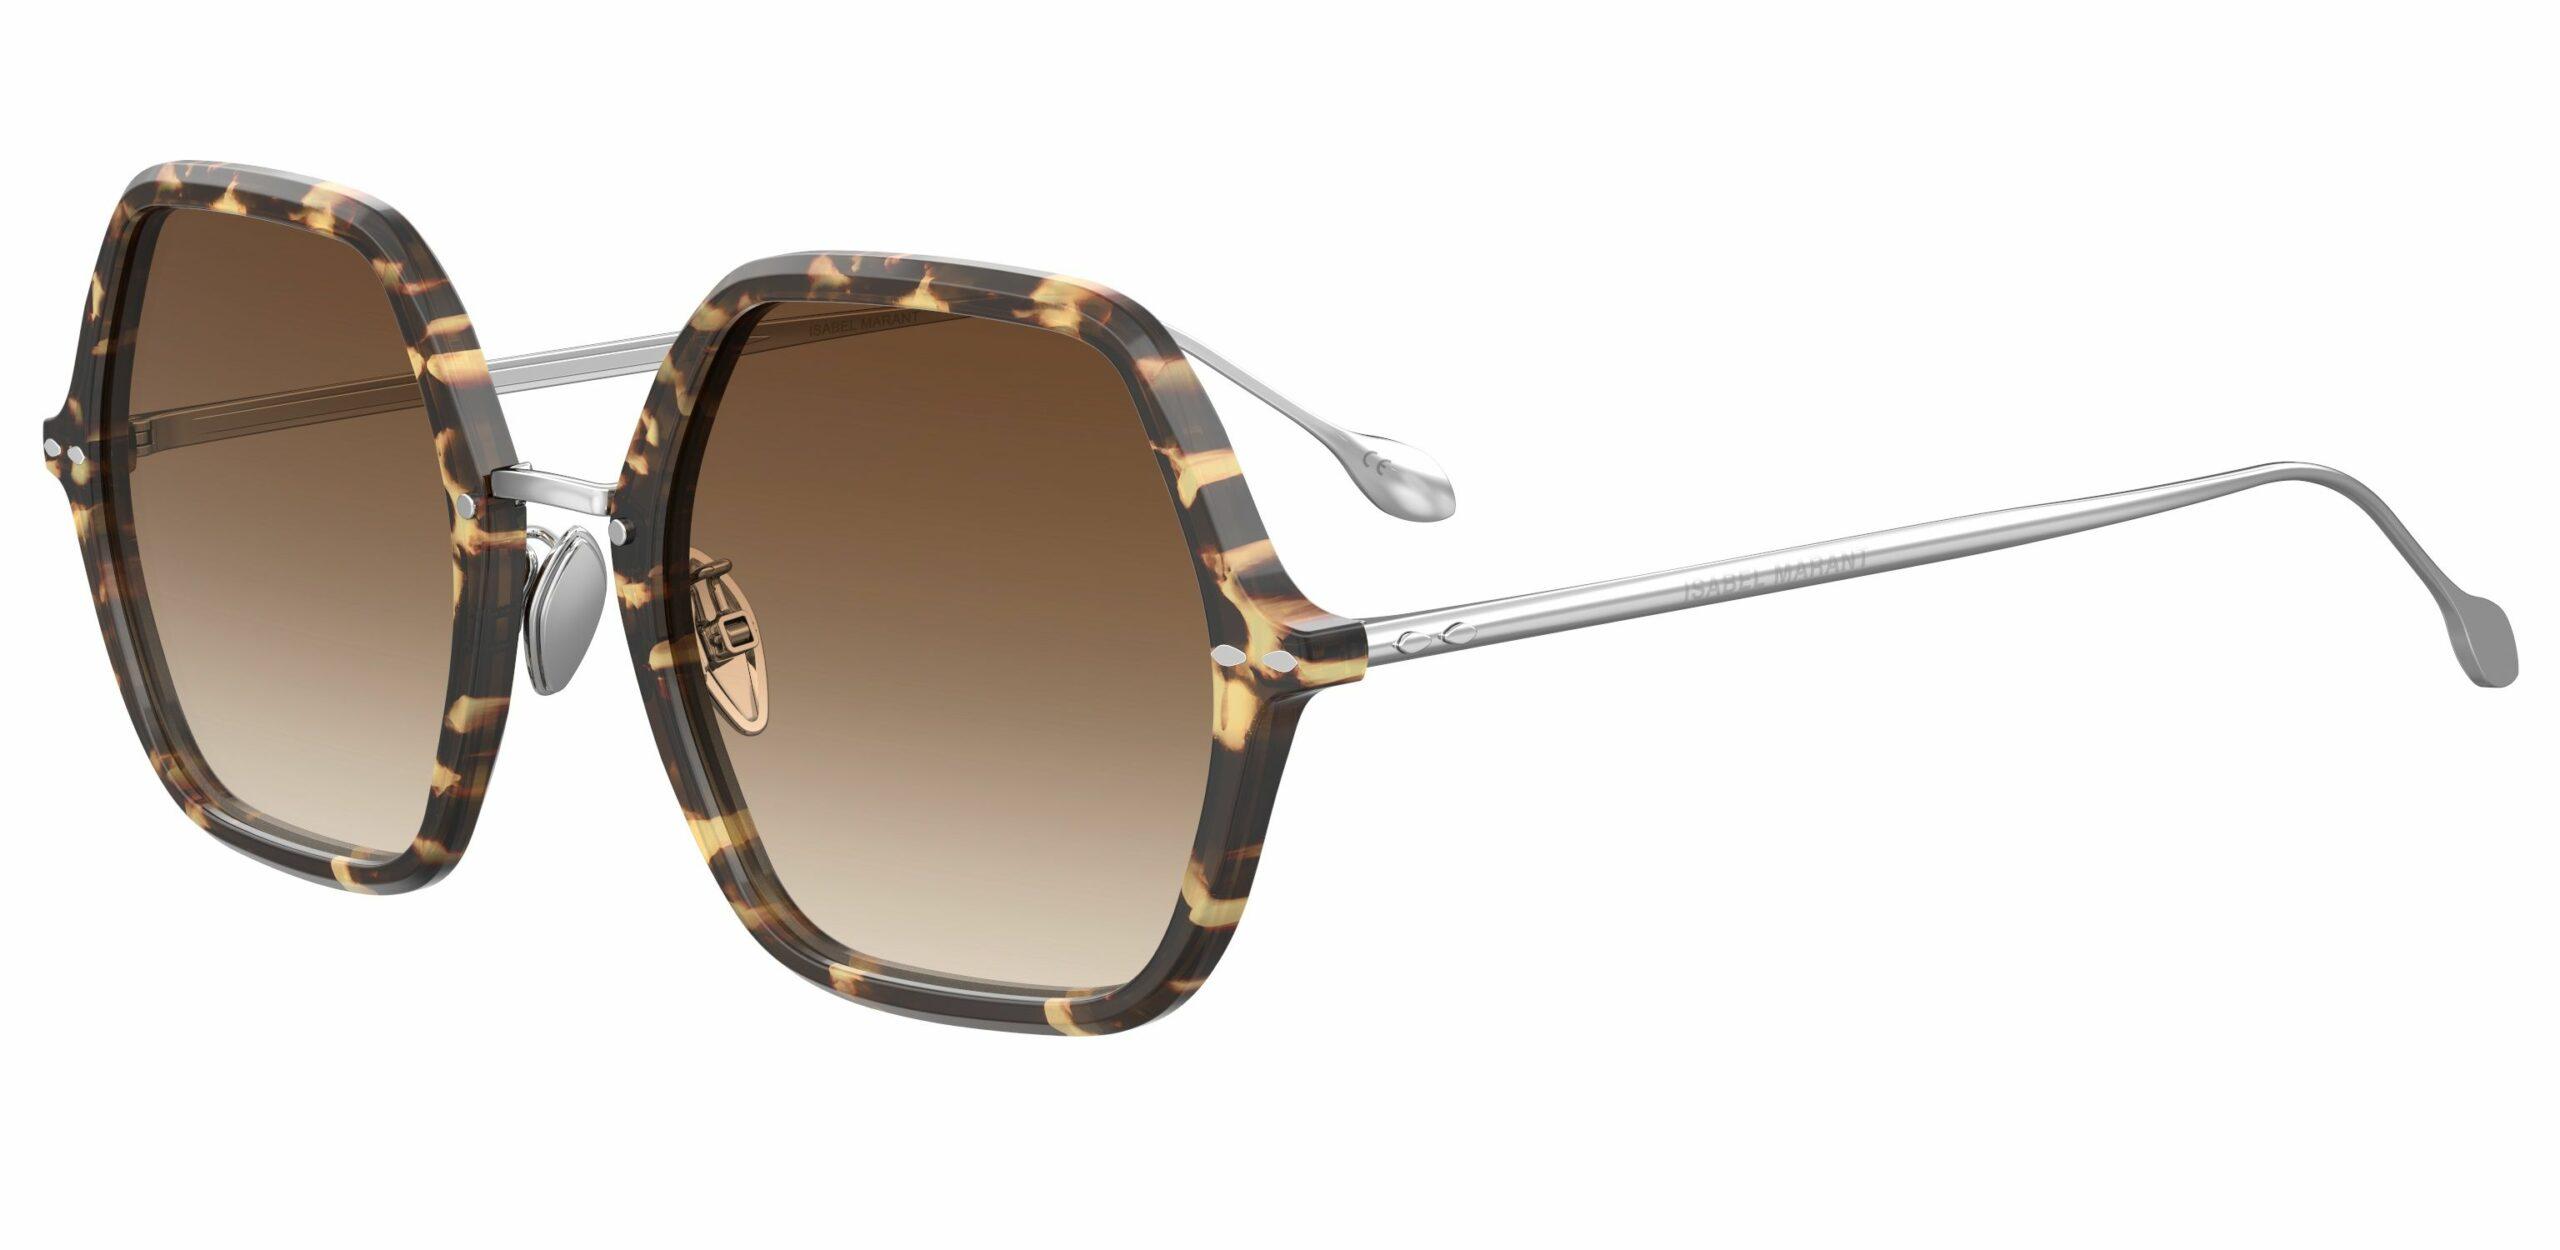 Sonnenbrille, Isabel Marant, Loise, Sunglasses